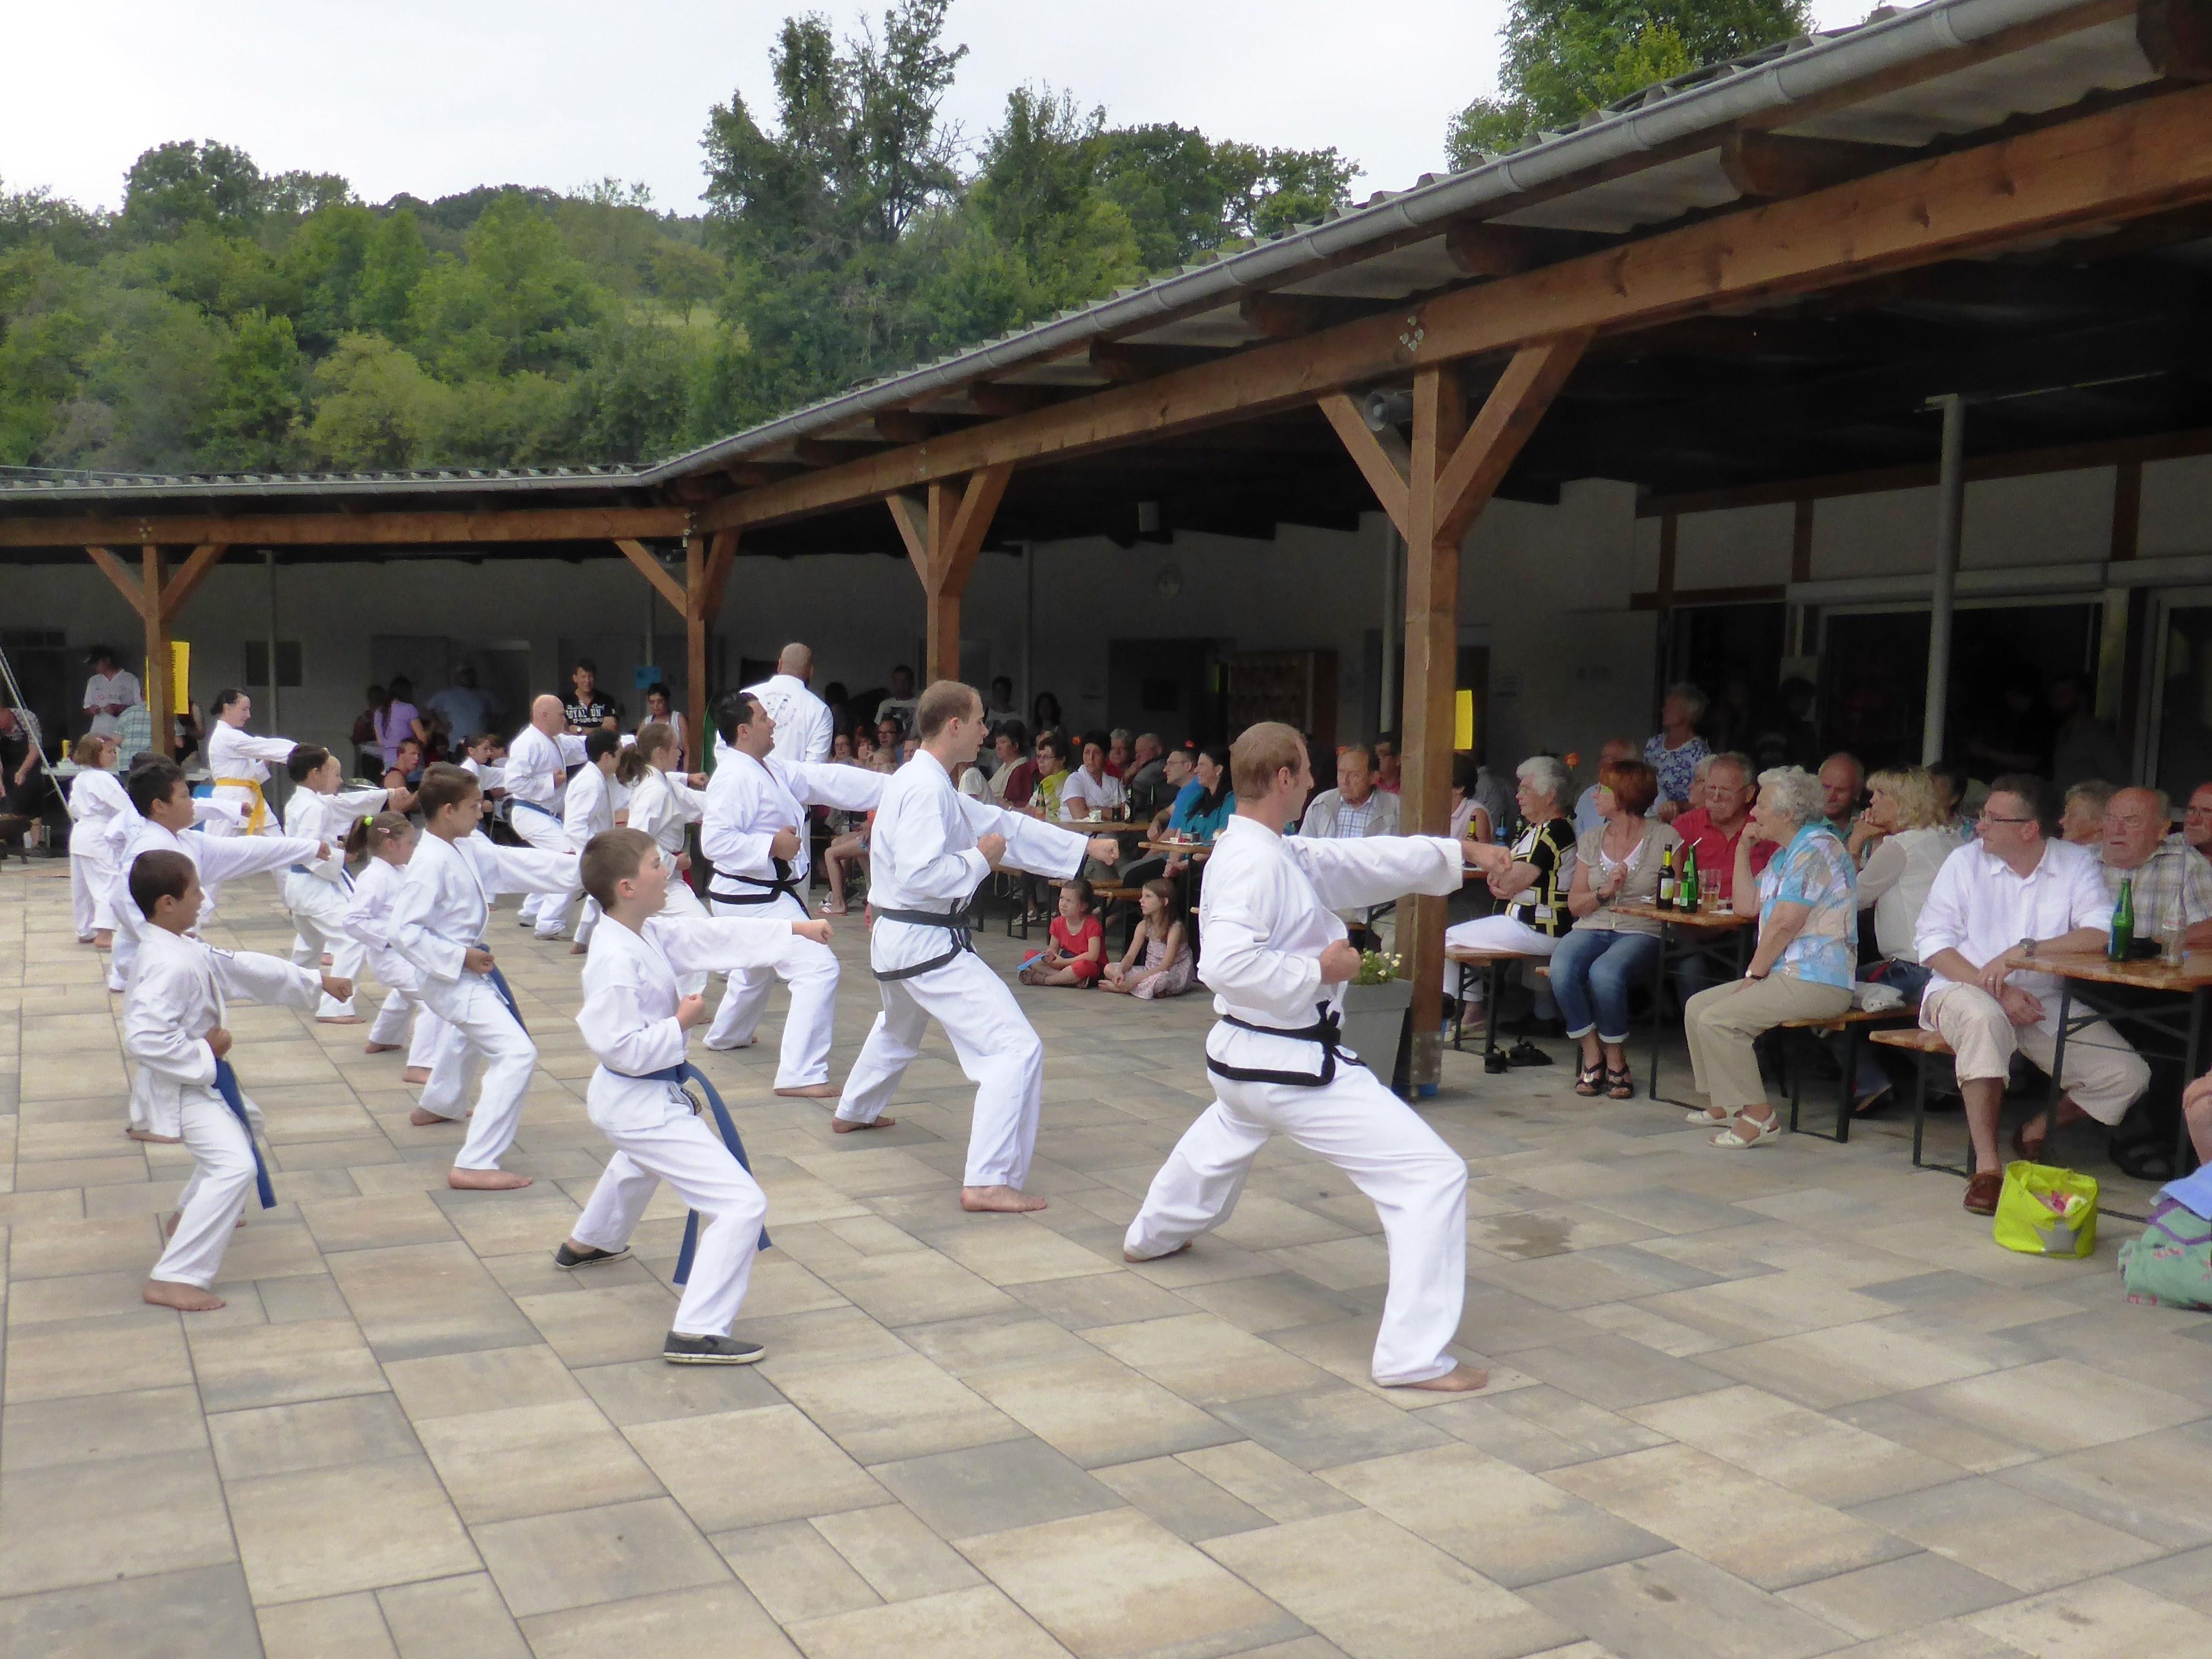 Waldschwimmbad Oberscheld - Taekwondo-Gruppe